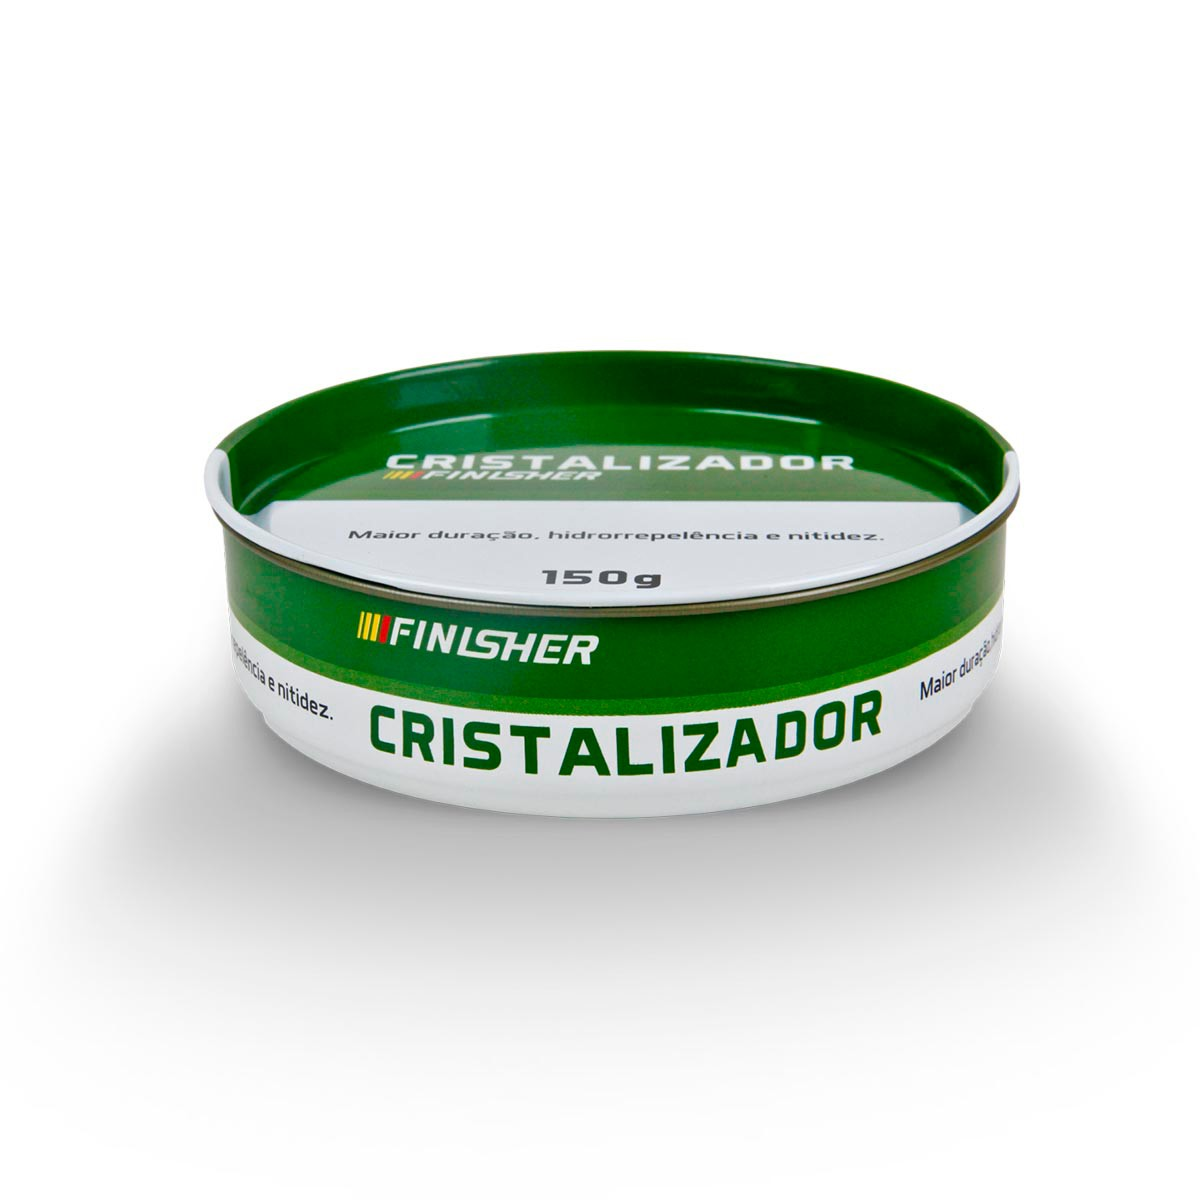 Cristalizador 150G - Finisher